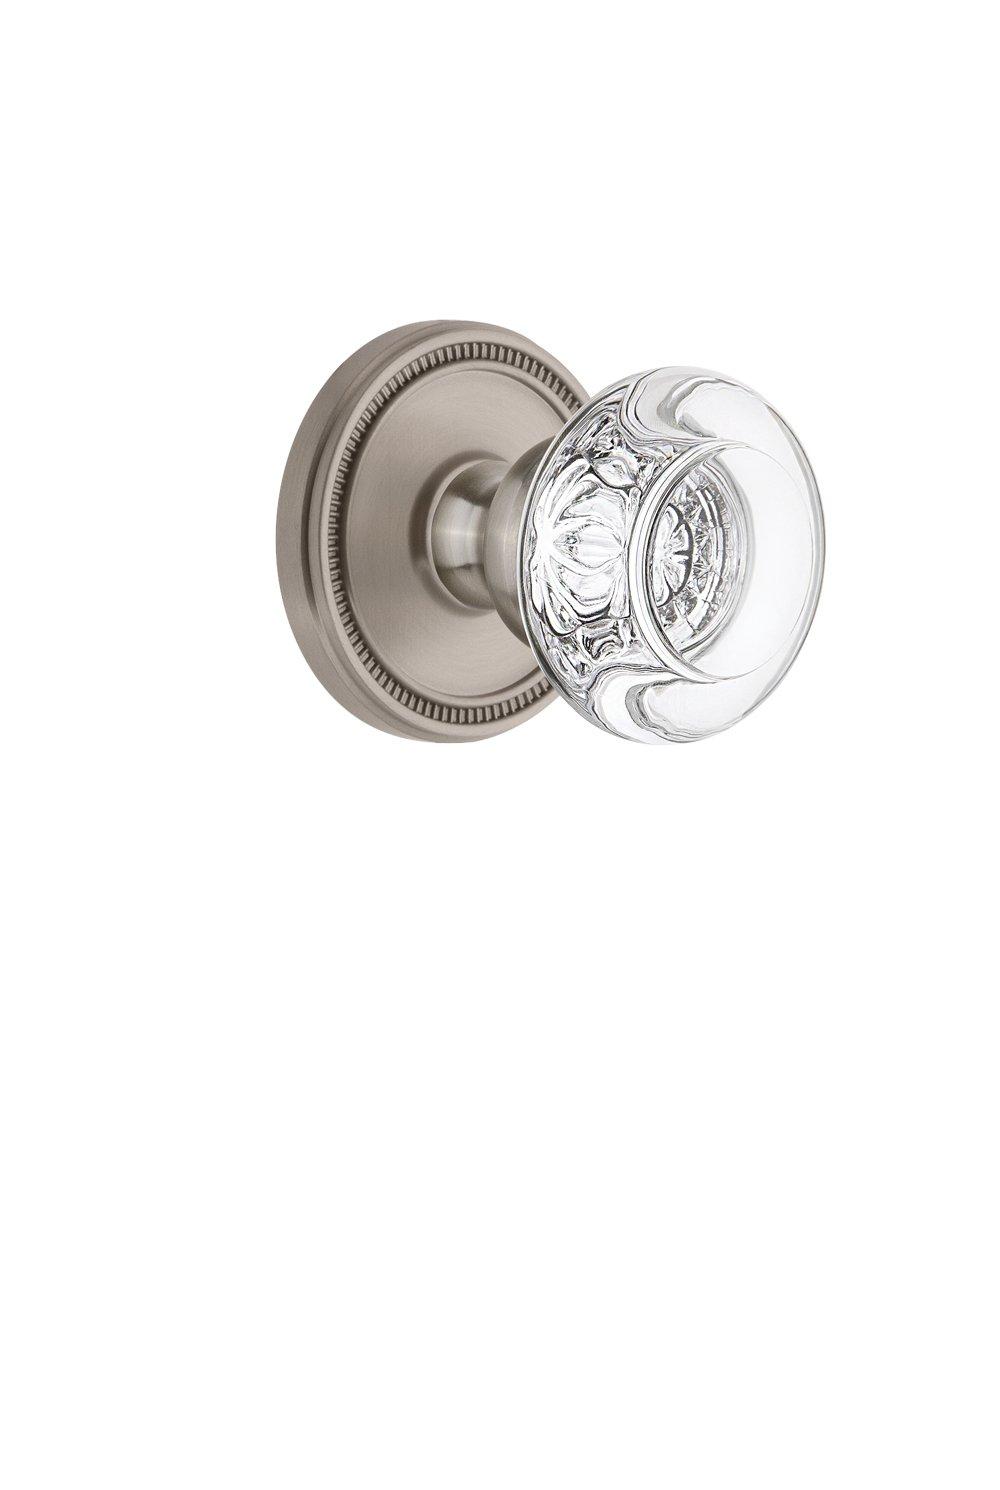 Grandeur 809156 Soleil Rosette Passage with Bordeaux Crystal Knob in Lifetime Brass 2.375